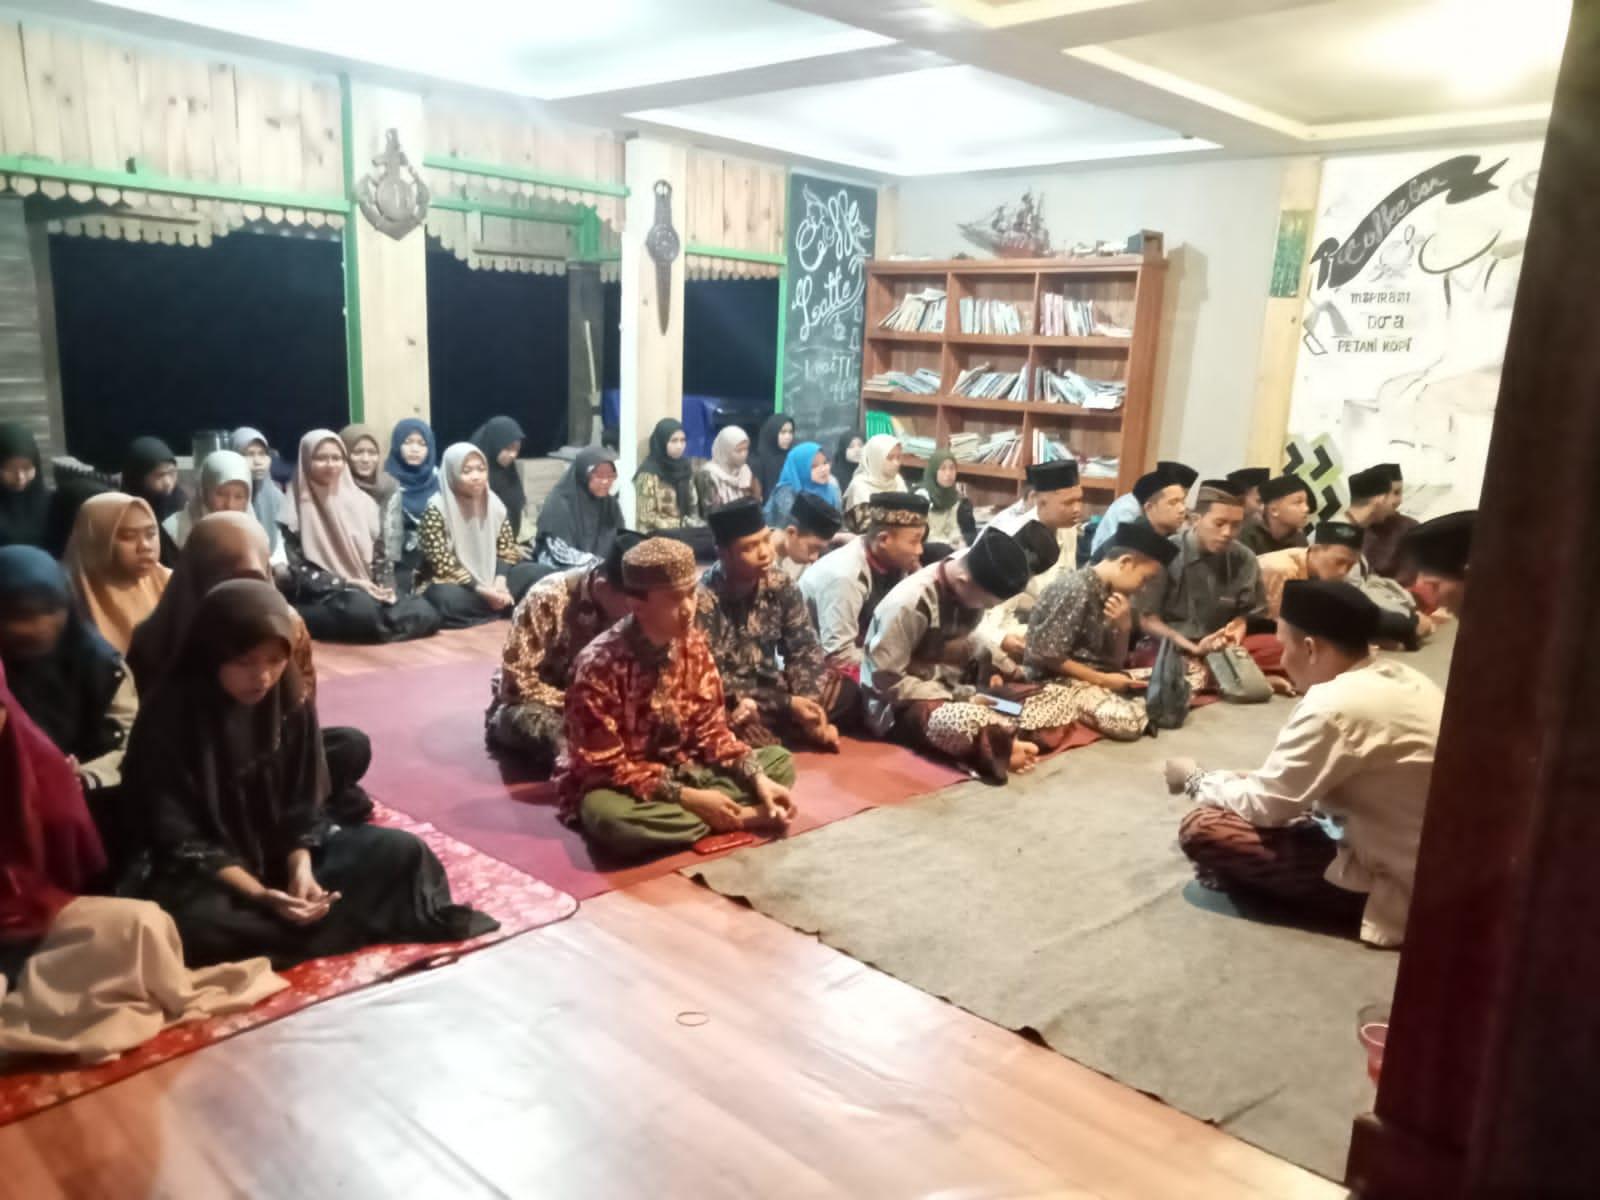 Bangun Solidaritas, Rapat Kerja Pelajar NU Menguneng Diiringi dengan Makrab dan Ziarah Kubur